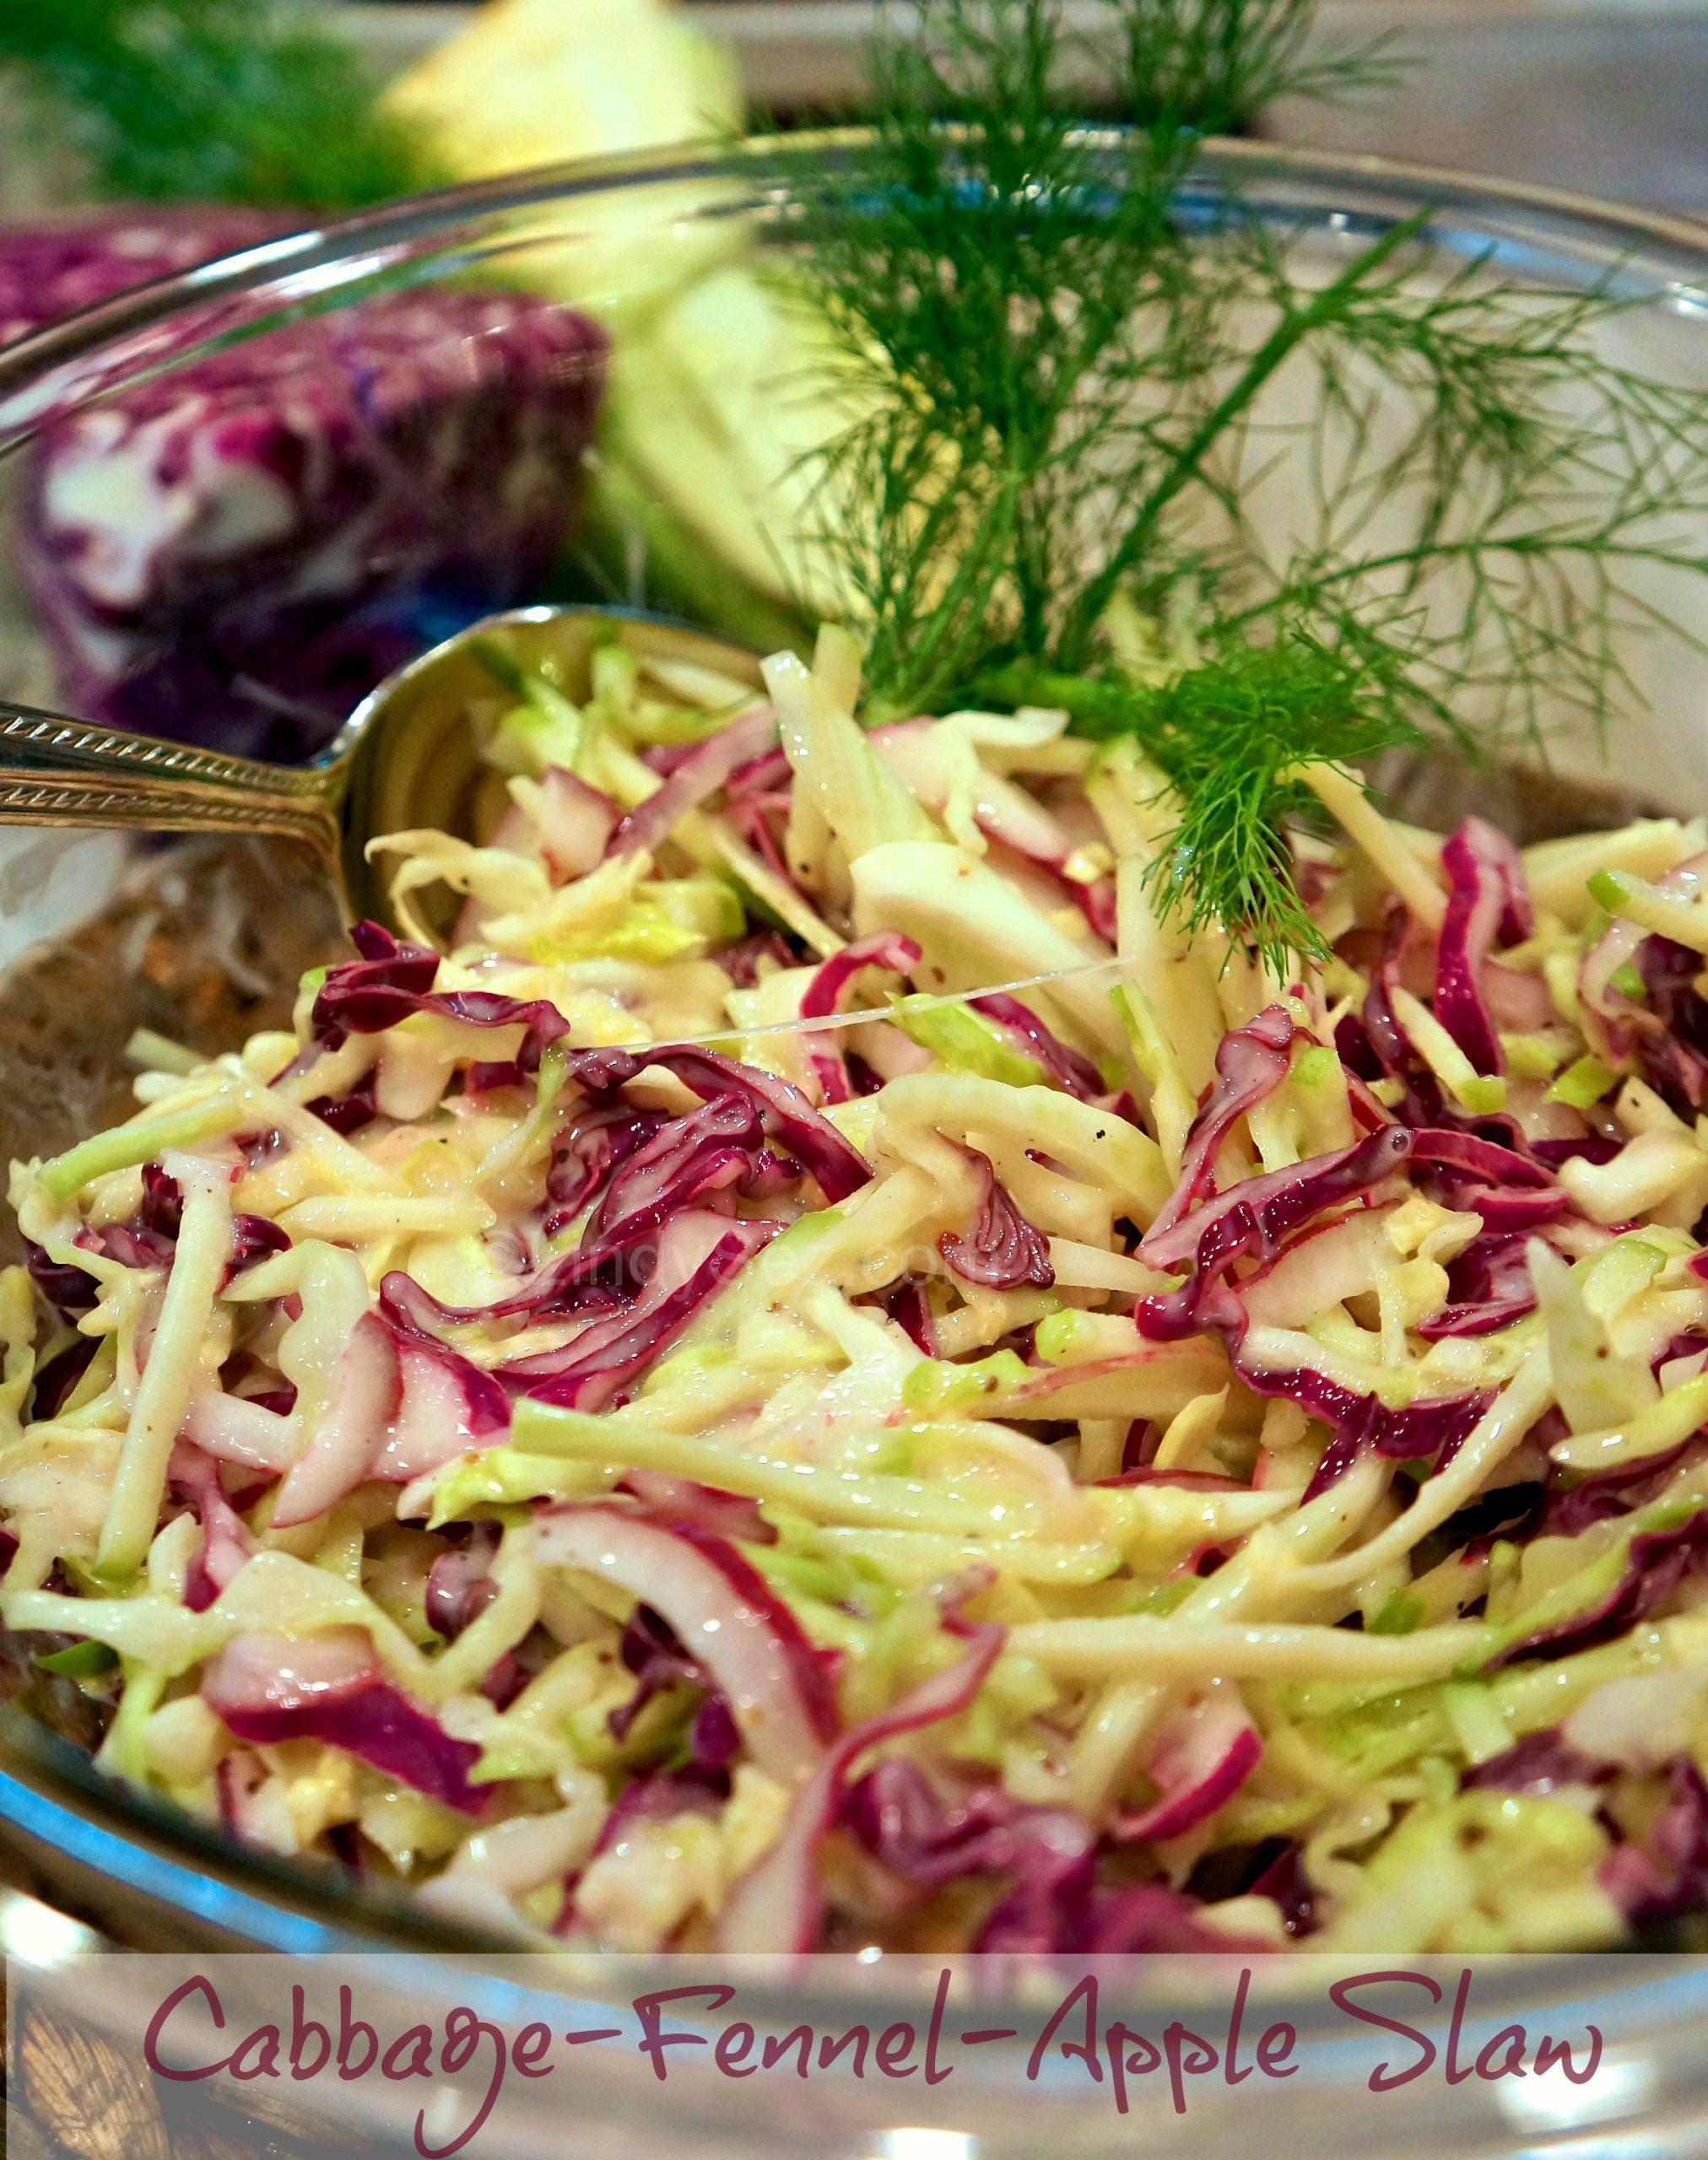 Cabbage-Fennel-Apple Slawin a bowl